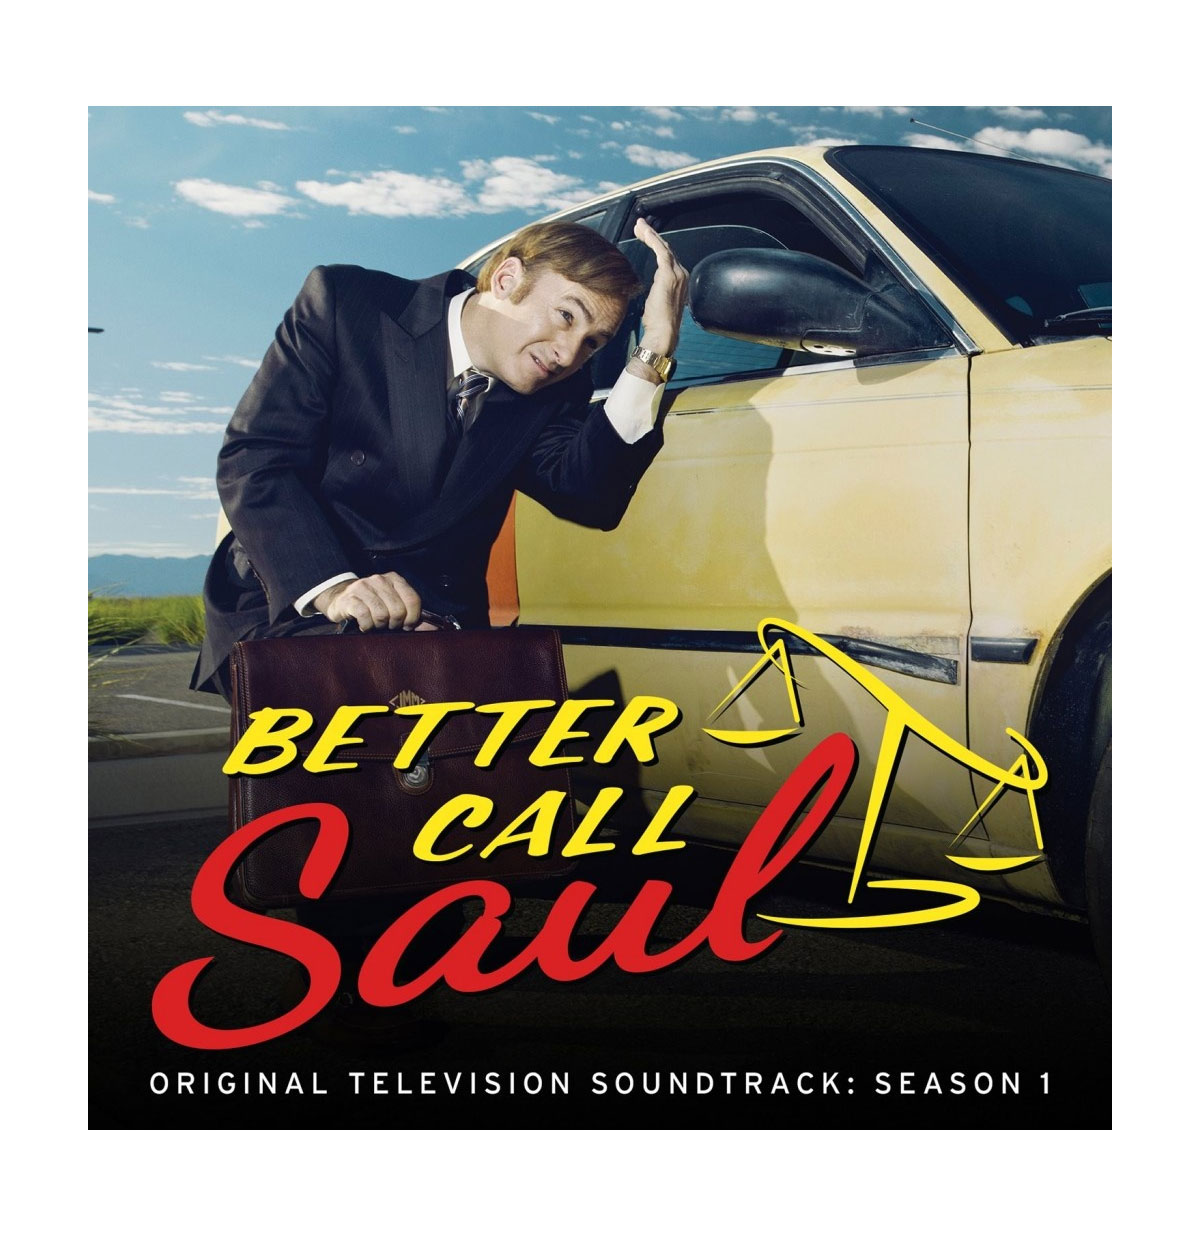 Better Call Saul - Original Television Soundtrack Season 1 LP